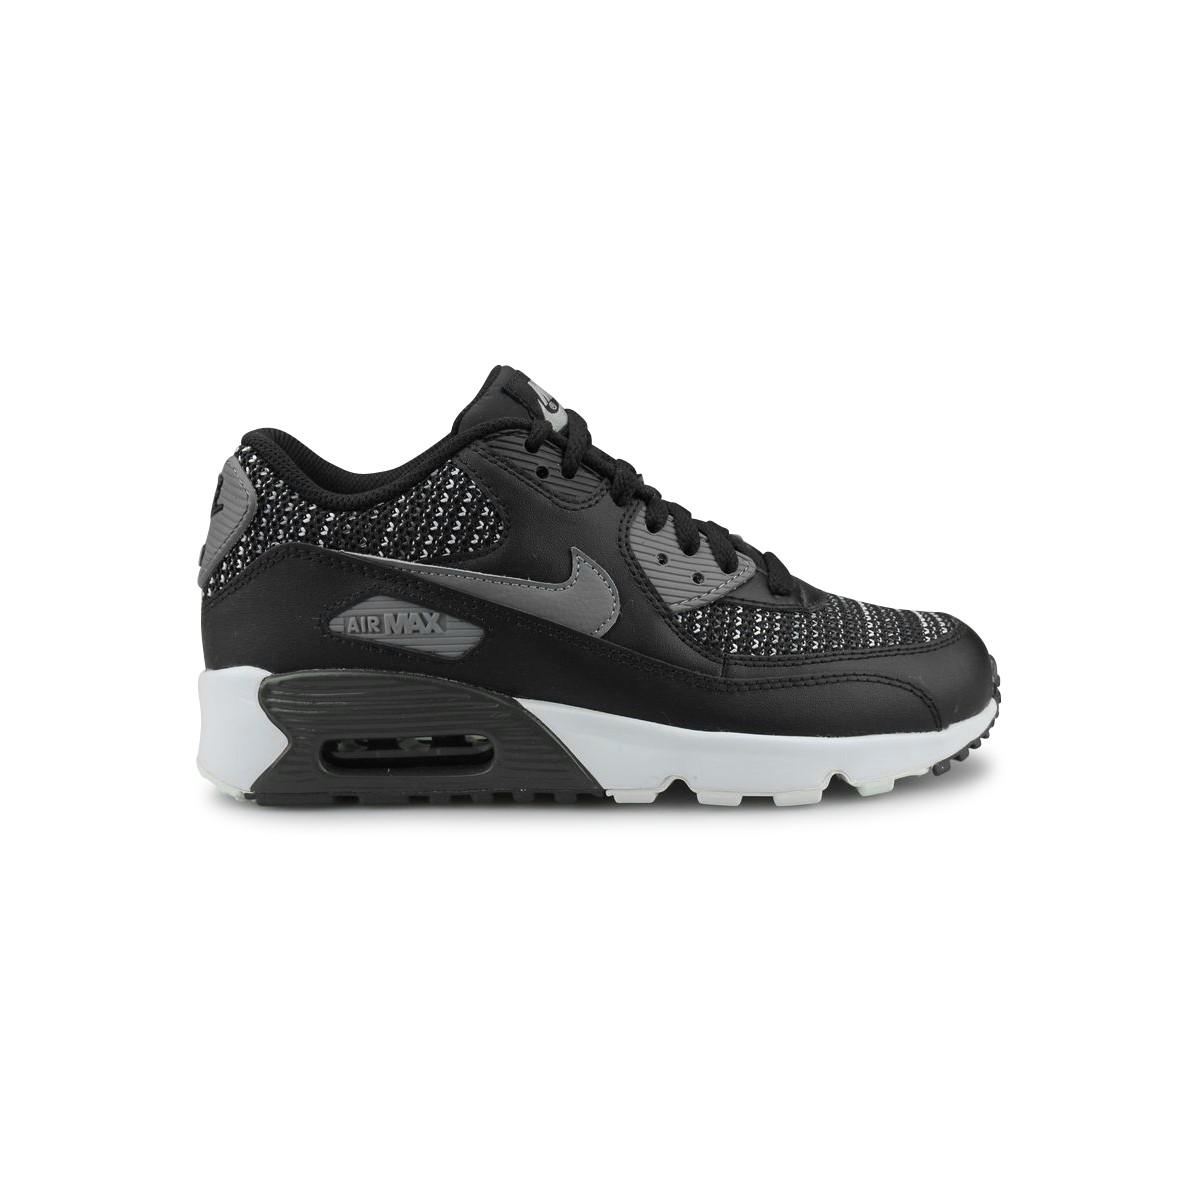 new product 170b7 c75b3 NIKE AIR MAX 90 MESH SE JUNIOR NOIR - Street Shoes Addict